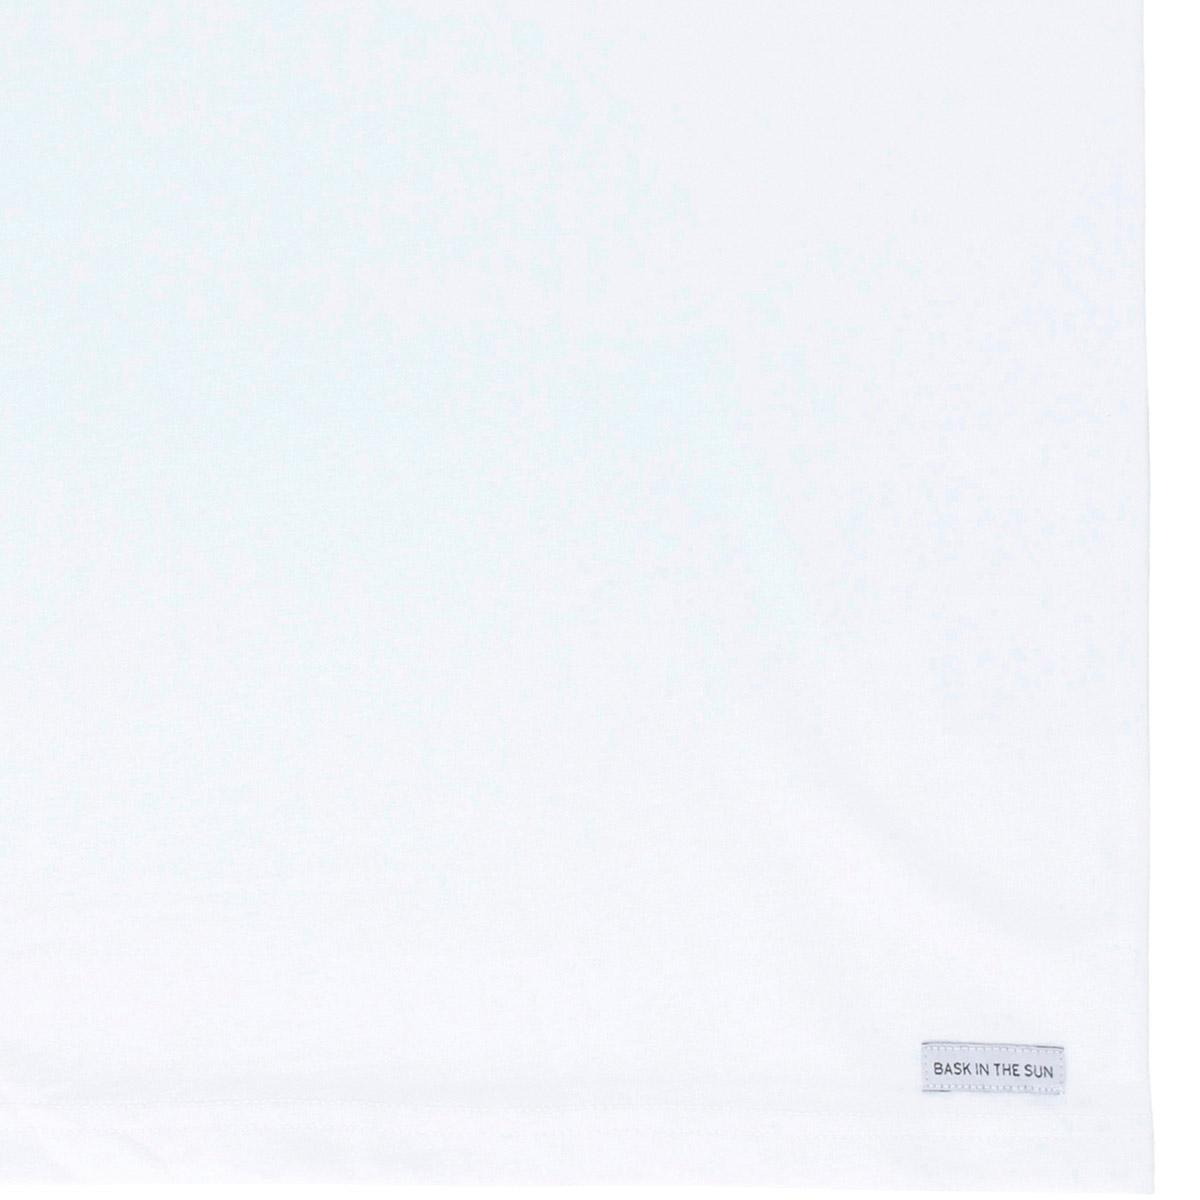 T-shirt en coton bio white tout terrain - Bask in the Sun num 3